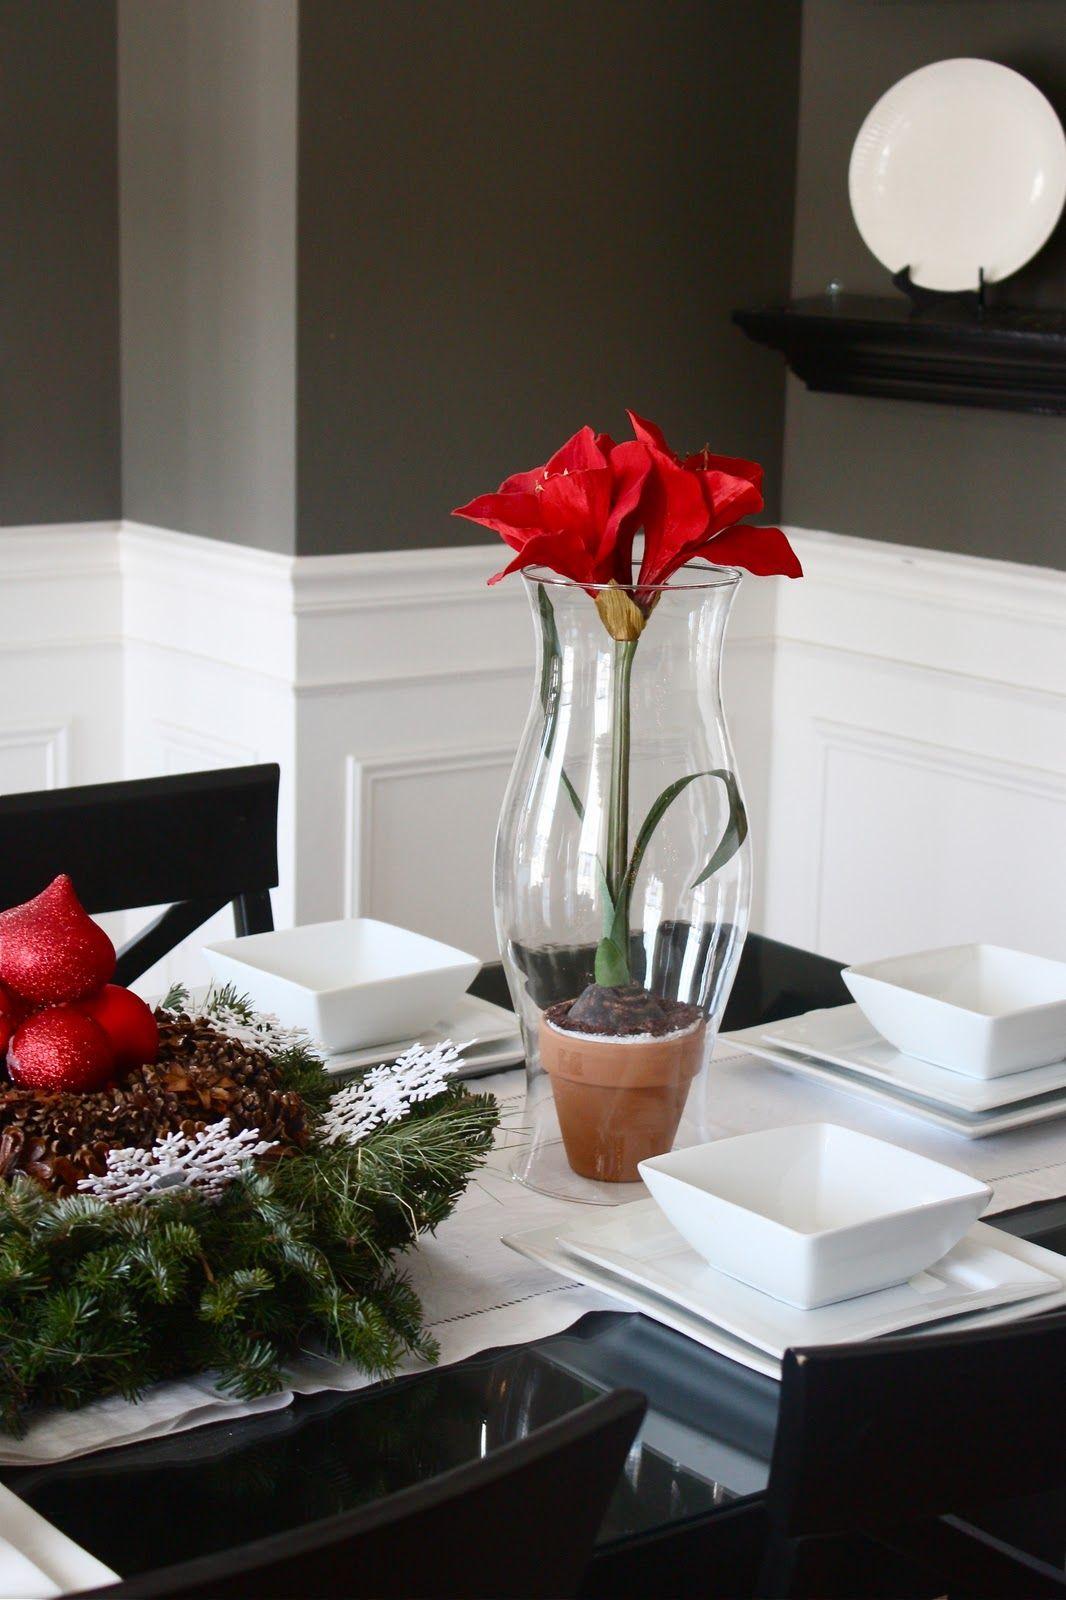 Great table decoration idea